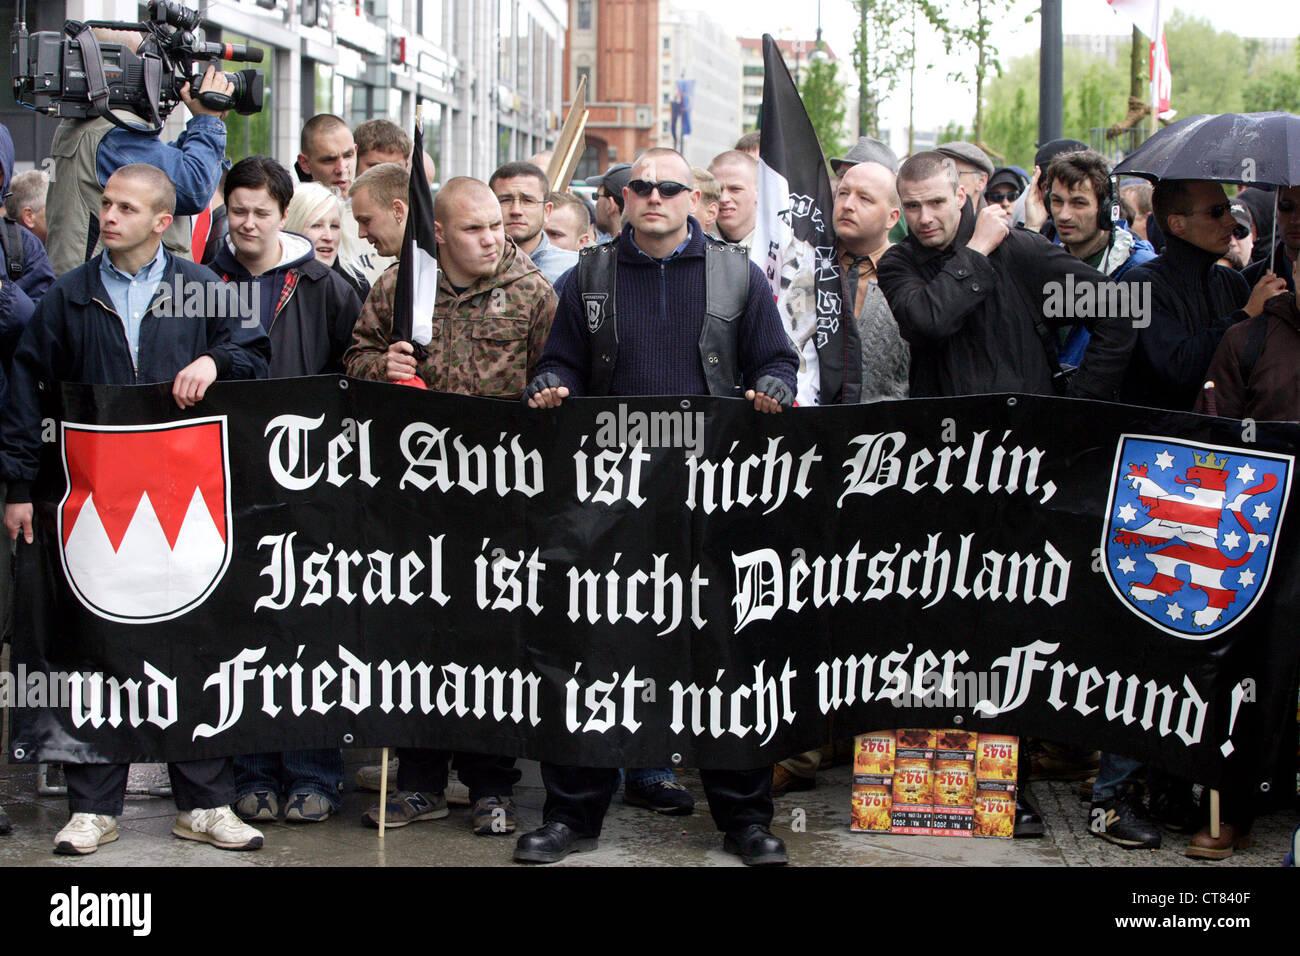 NPD rally in Berlin Stock Photo